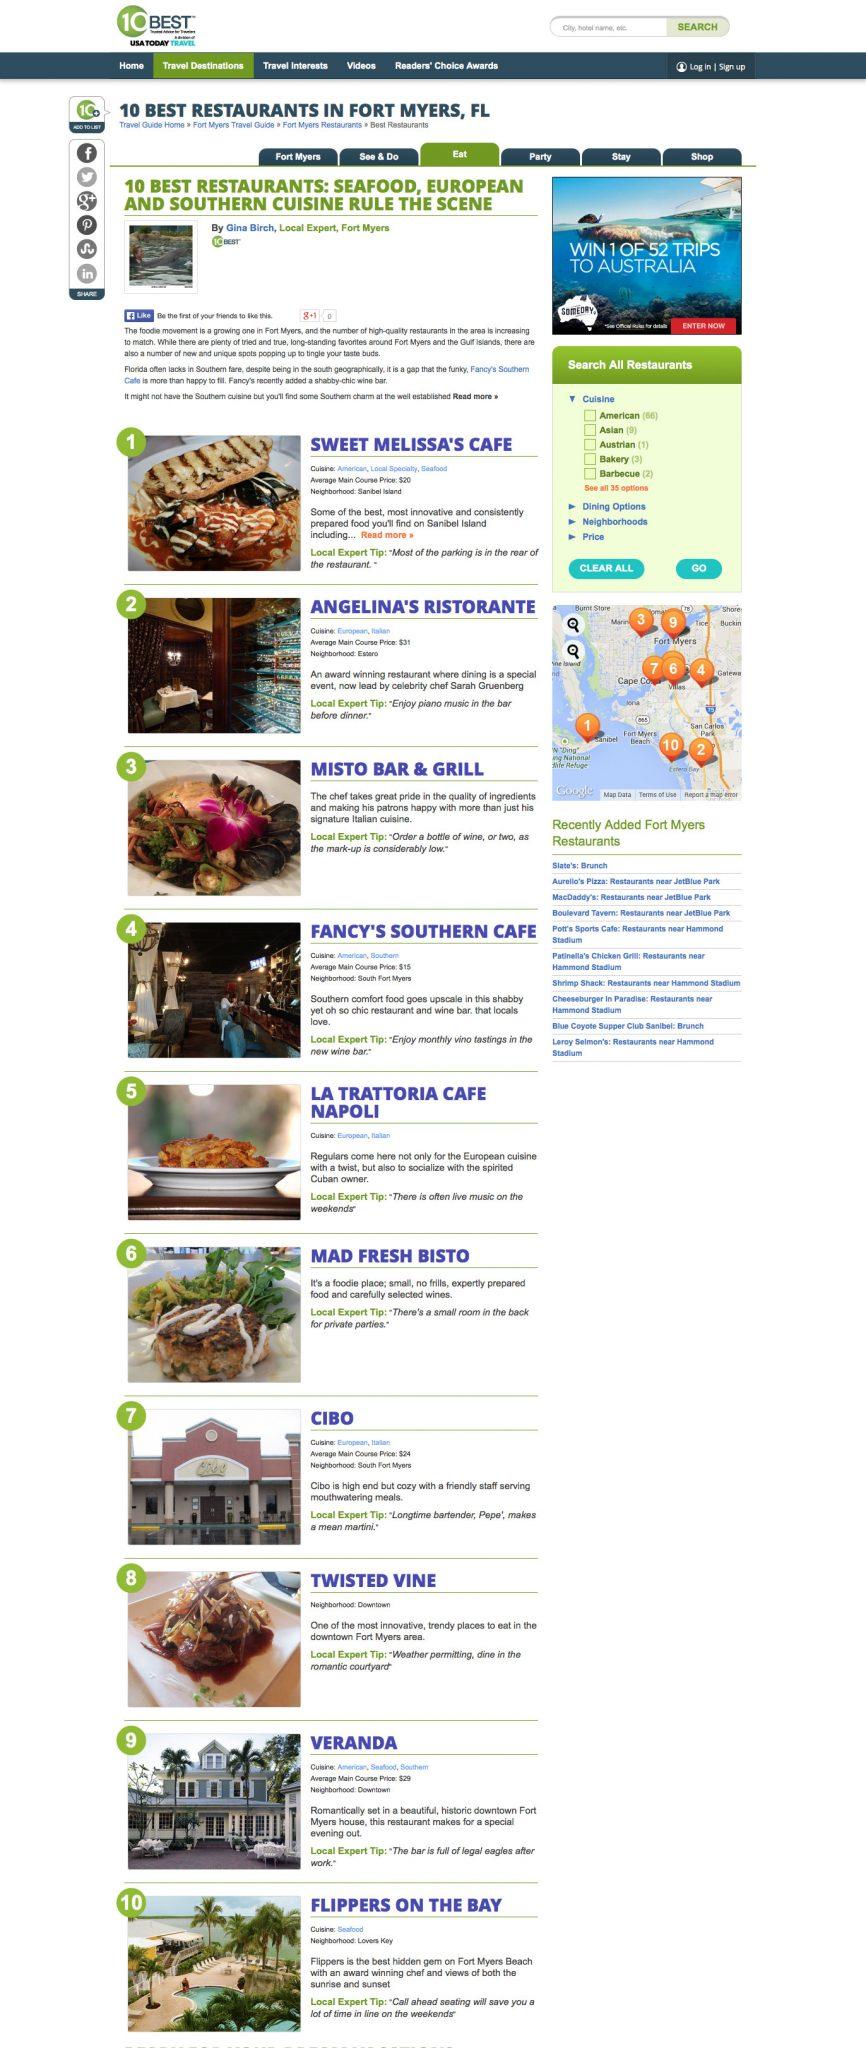 screenshot of fort myers 10 best restaurants